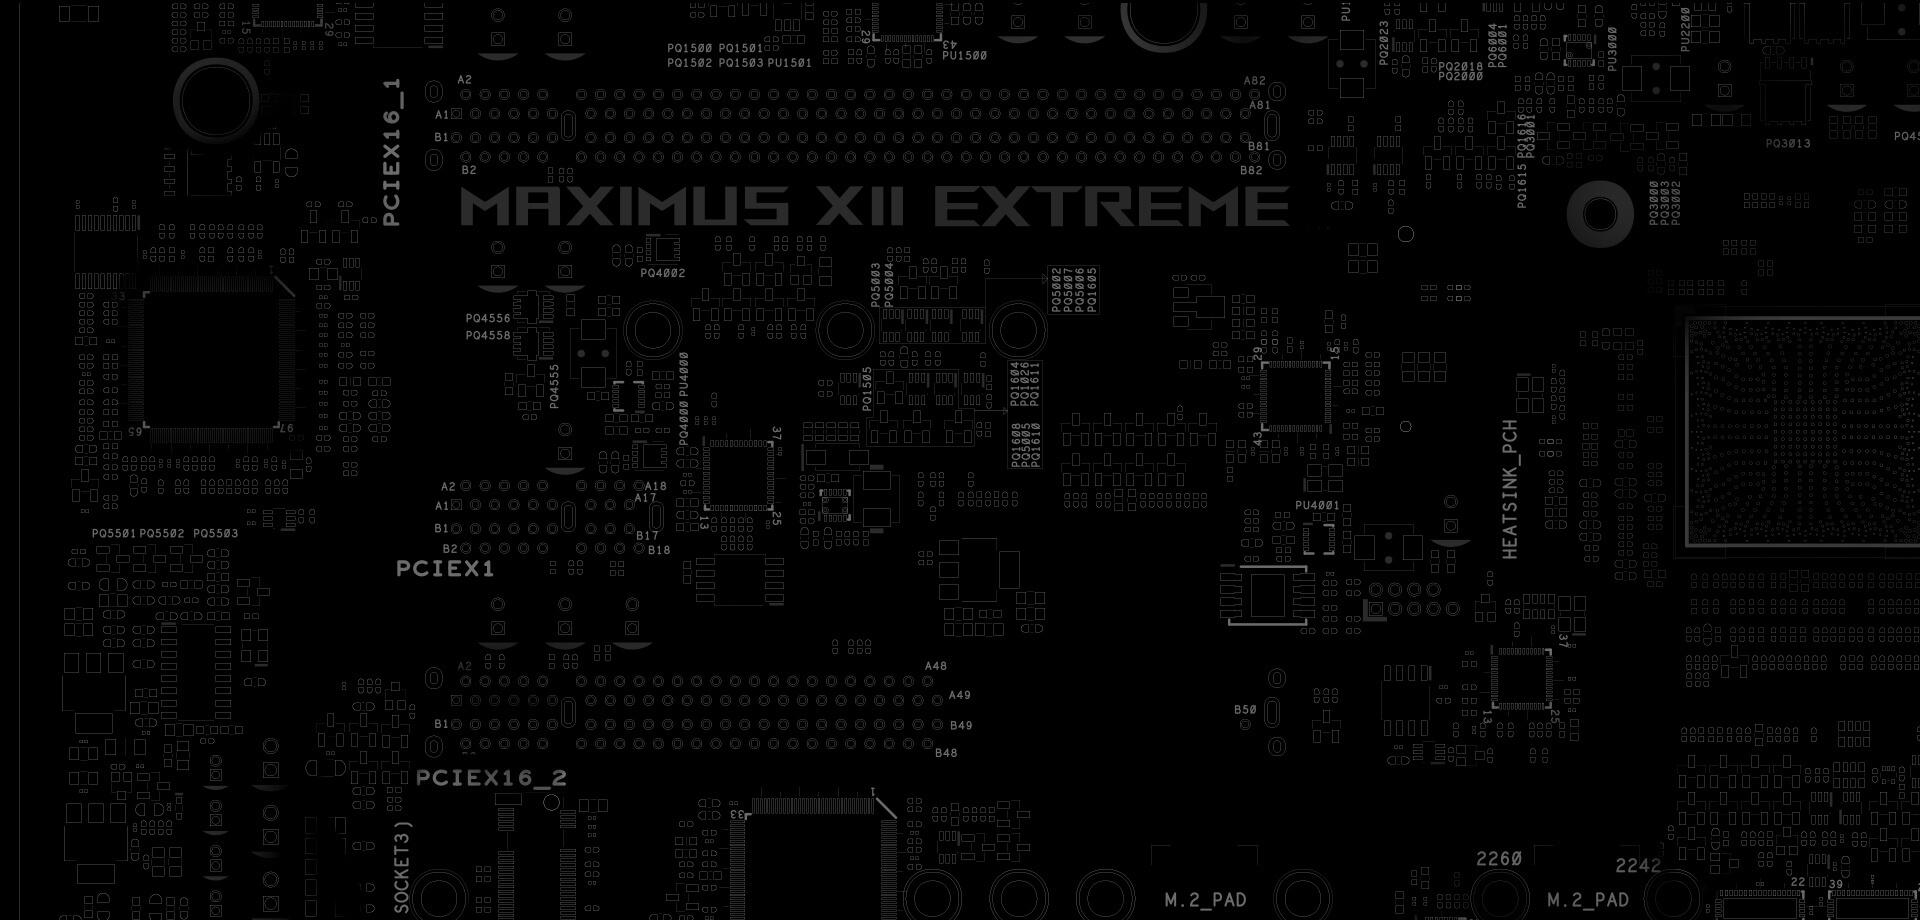 bo-mach-chu-mainboard-asus-rog-maximus-xii-extreme-z490-lga1200-thunderboltex-3-tr-wifi6-lan-10gb-aura-sync-11